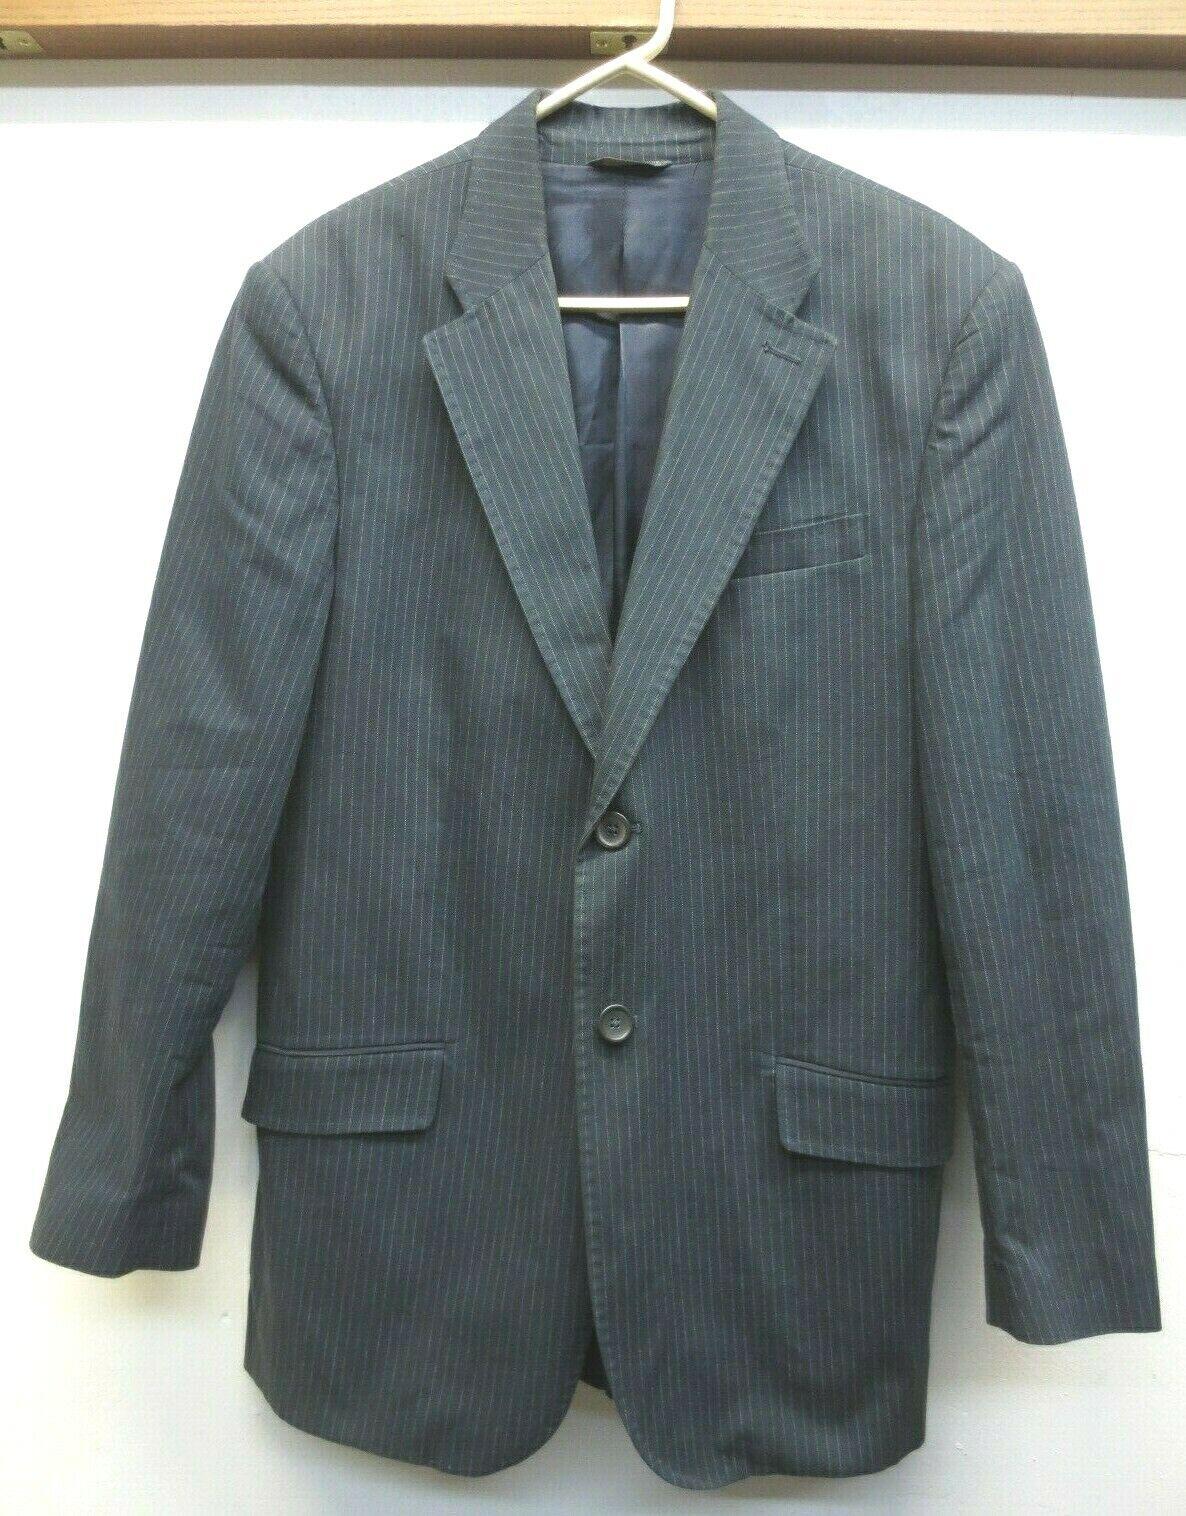 EUC Banana Republic Navy Pinstripe Cotton Linen Blend 2 Button Sport Coat Sz 42R